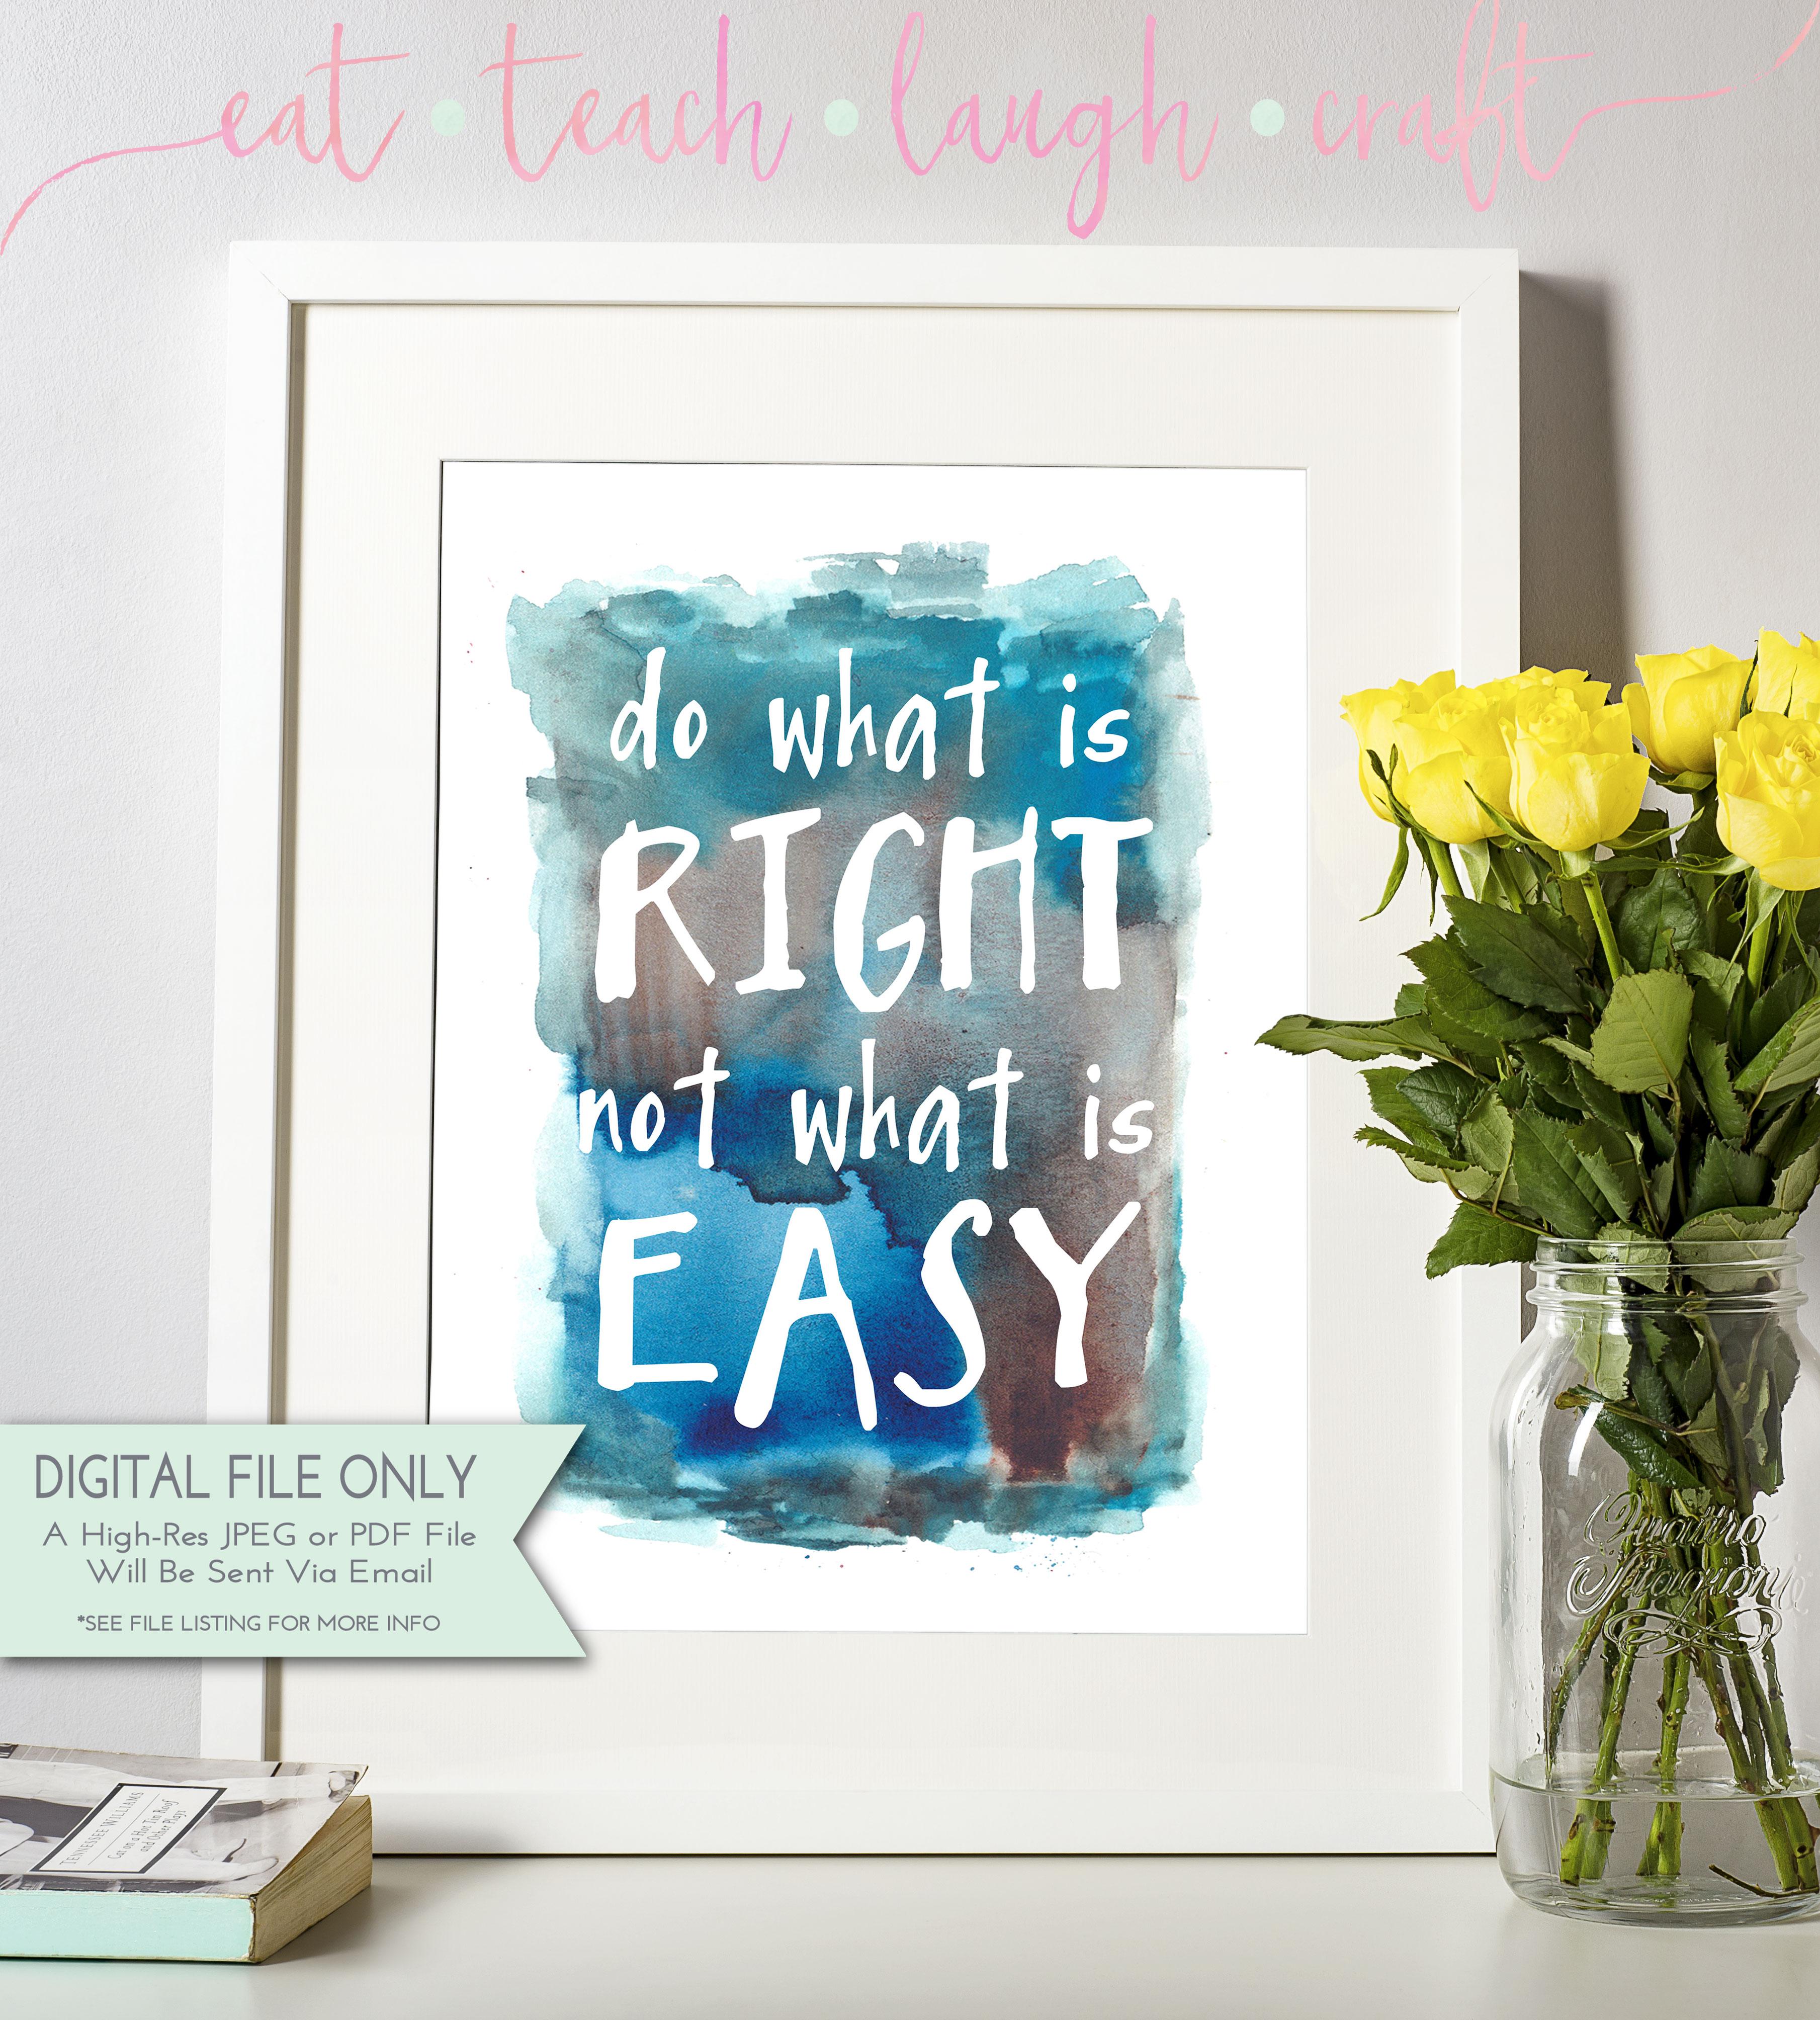 Best Motivational Quotes For Students: Watercolor Art Bundle